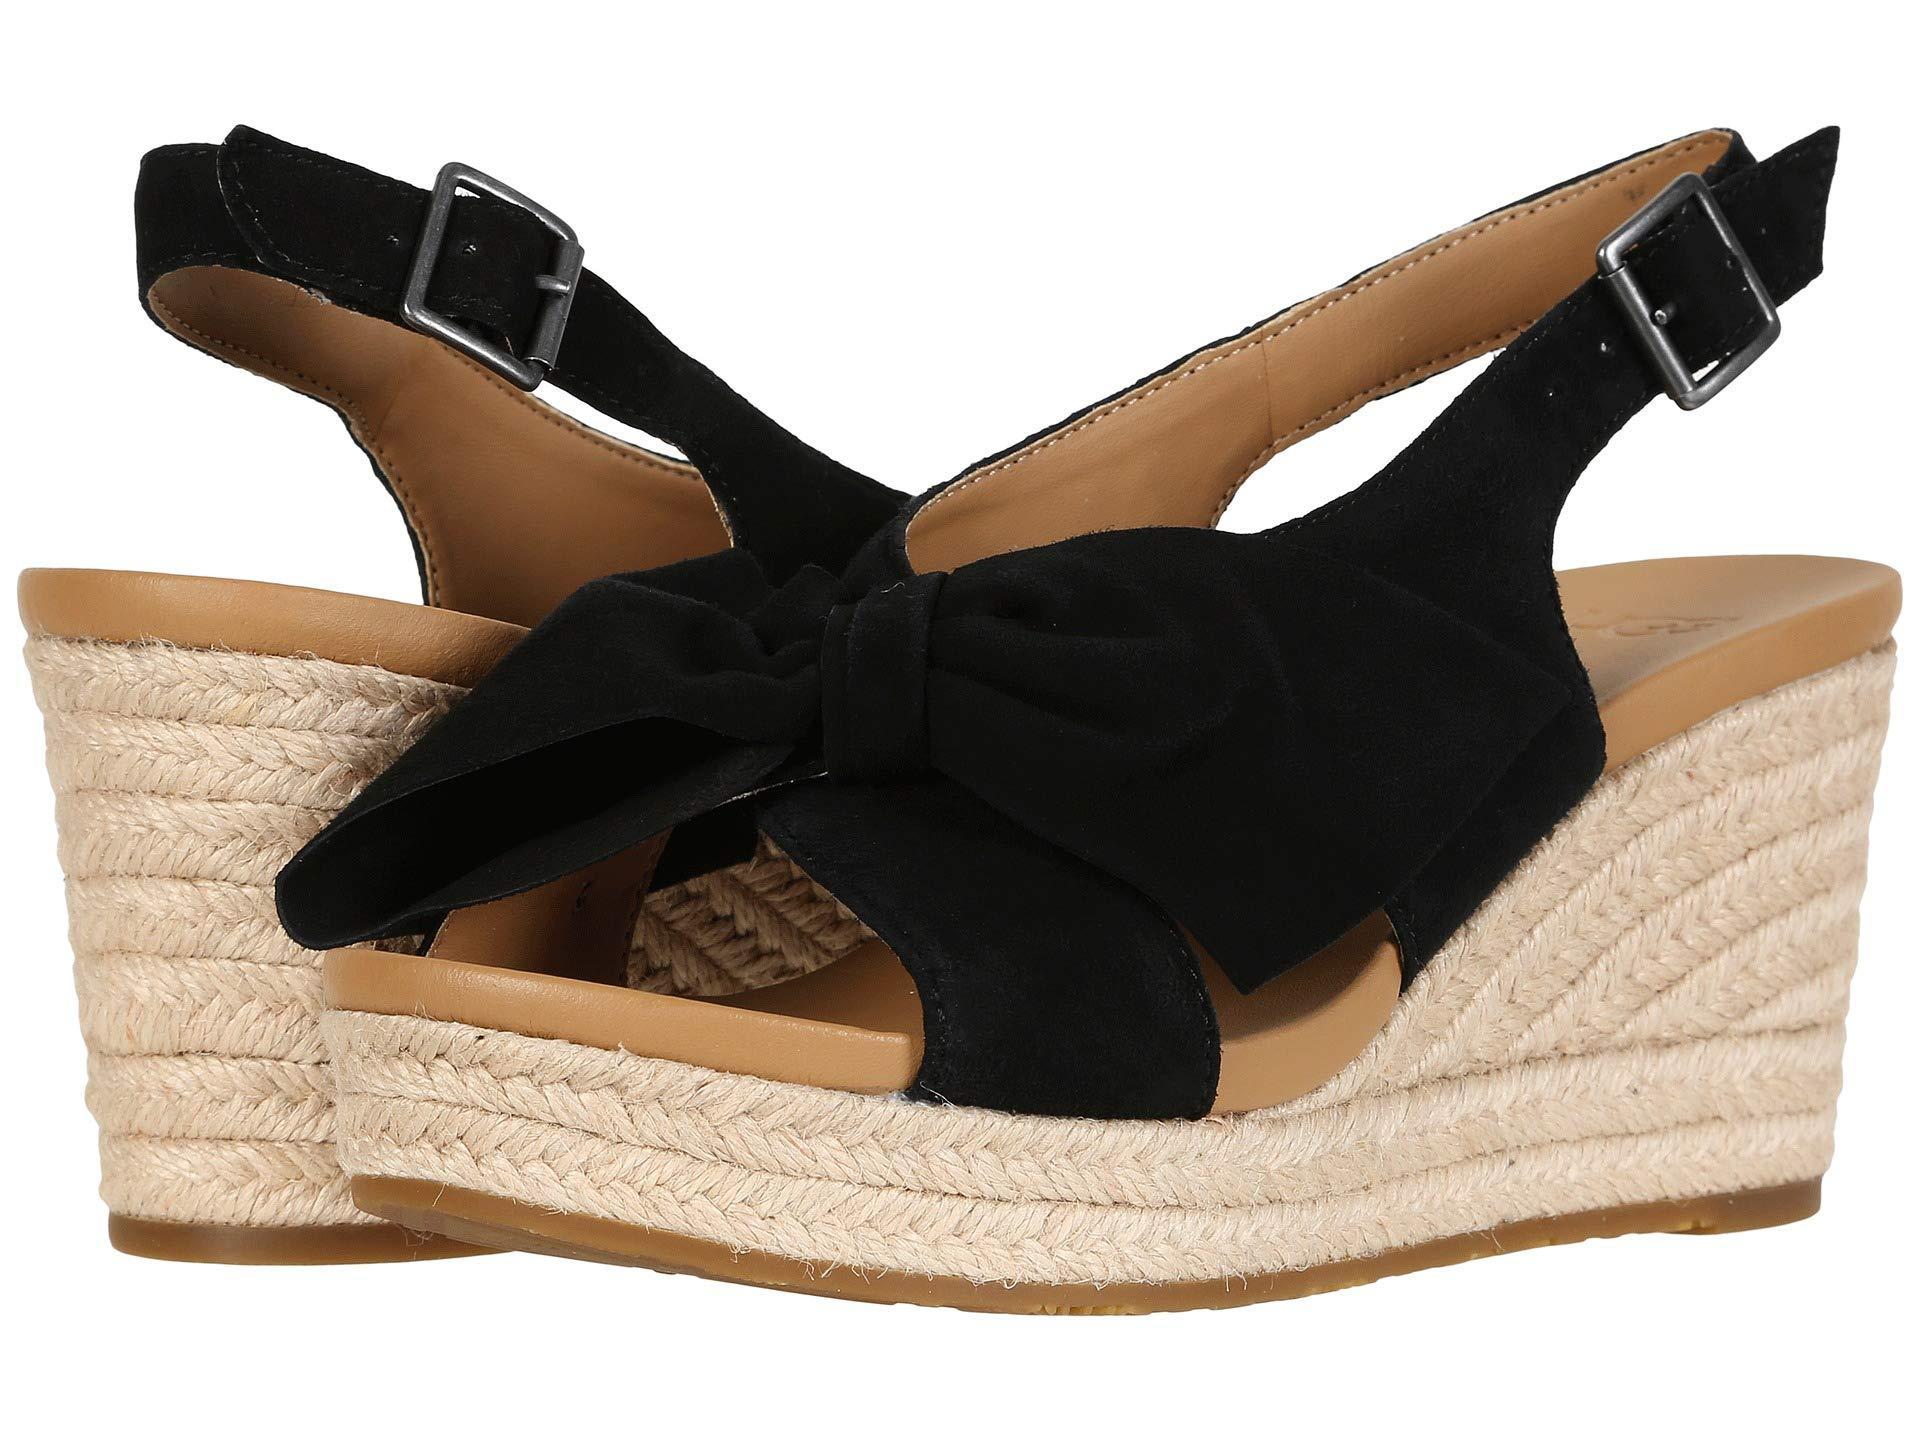 50692c91d76f Lyst - UGG Camilla (black) Women s Sandals in Black